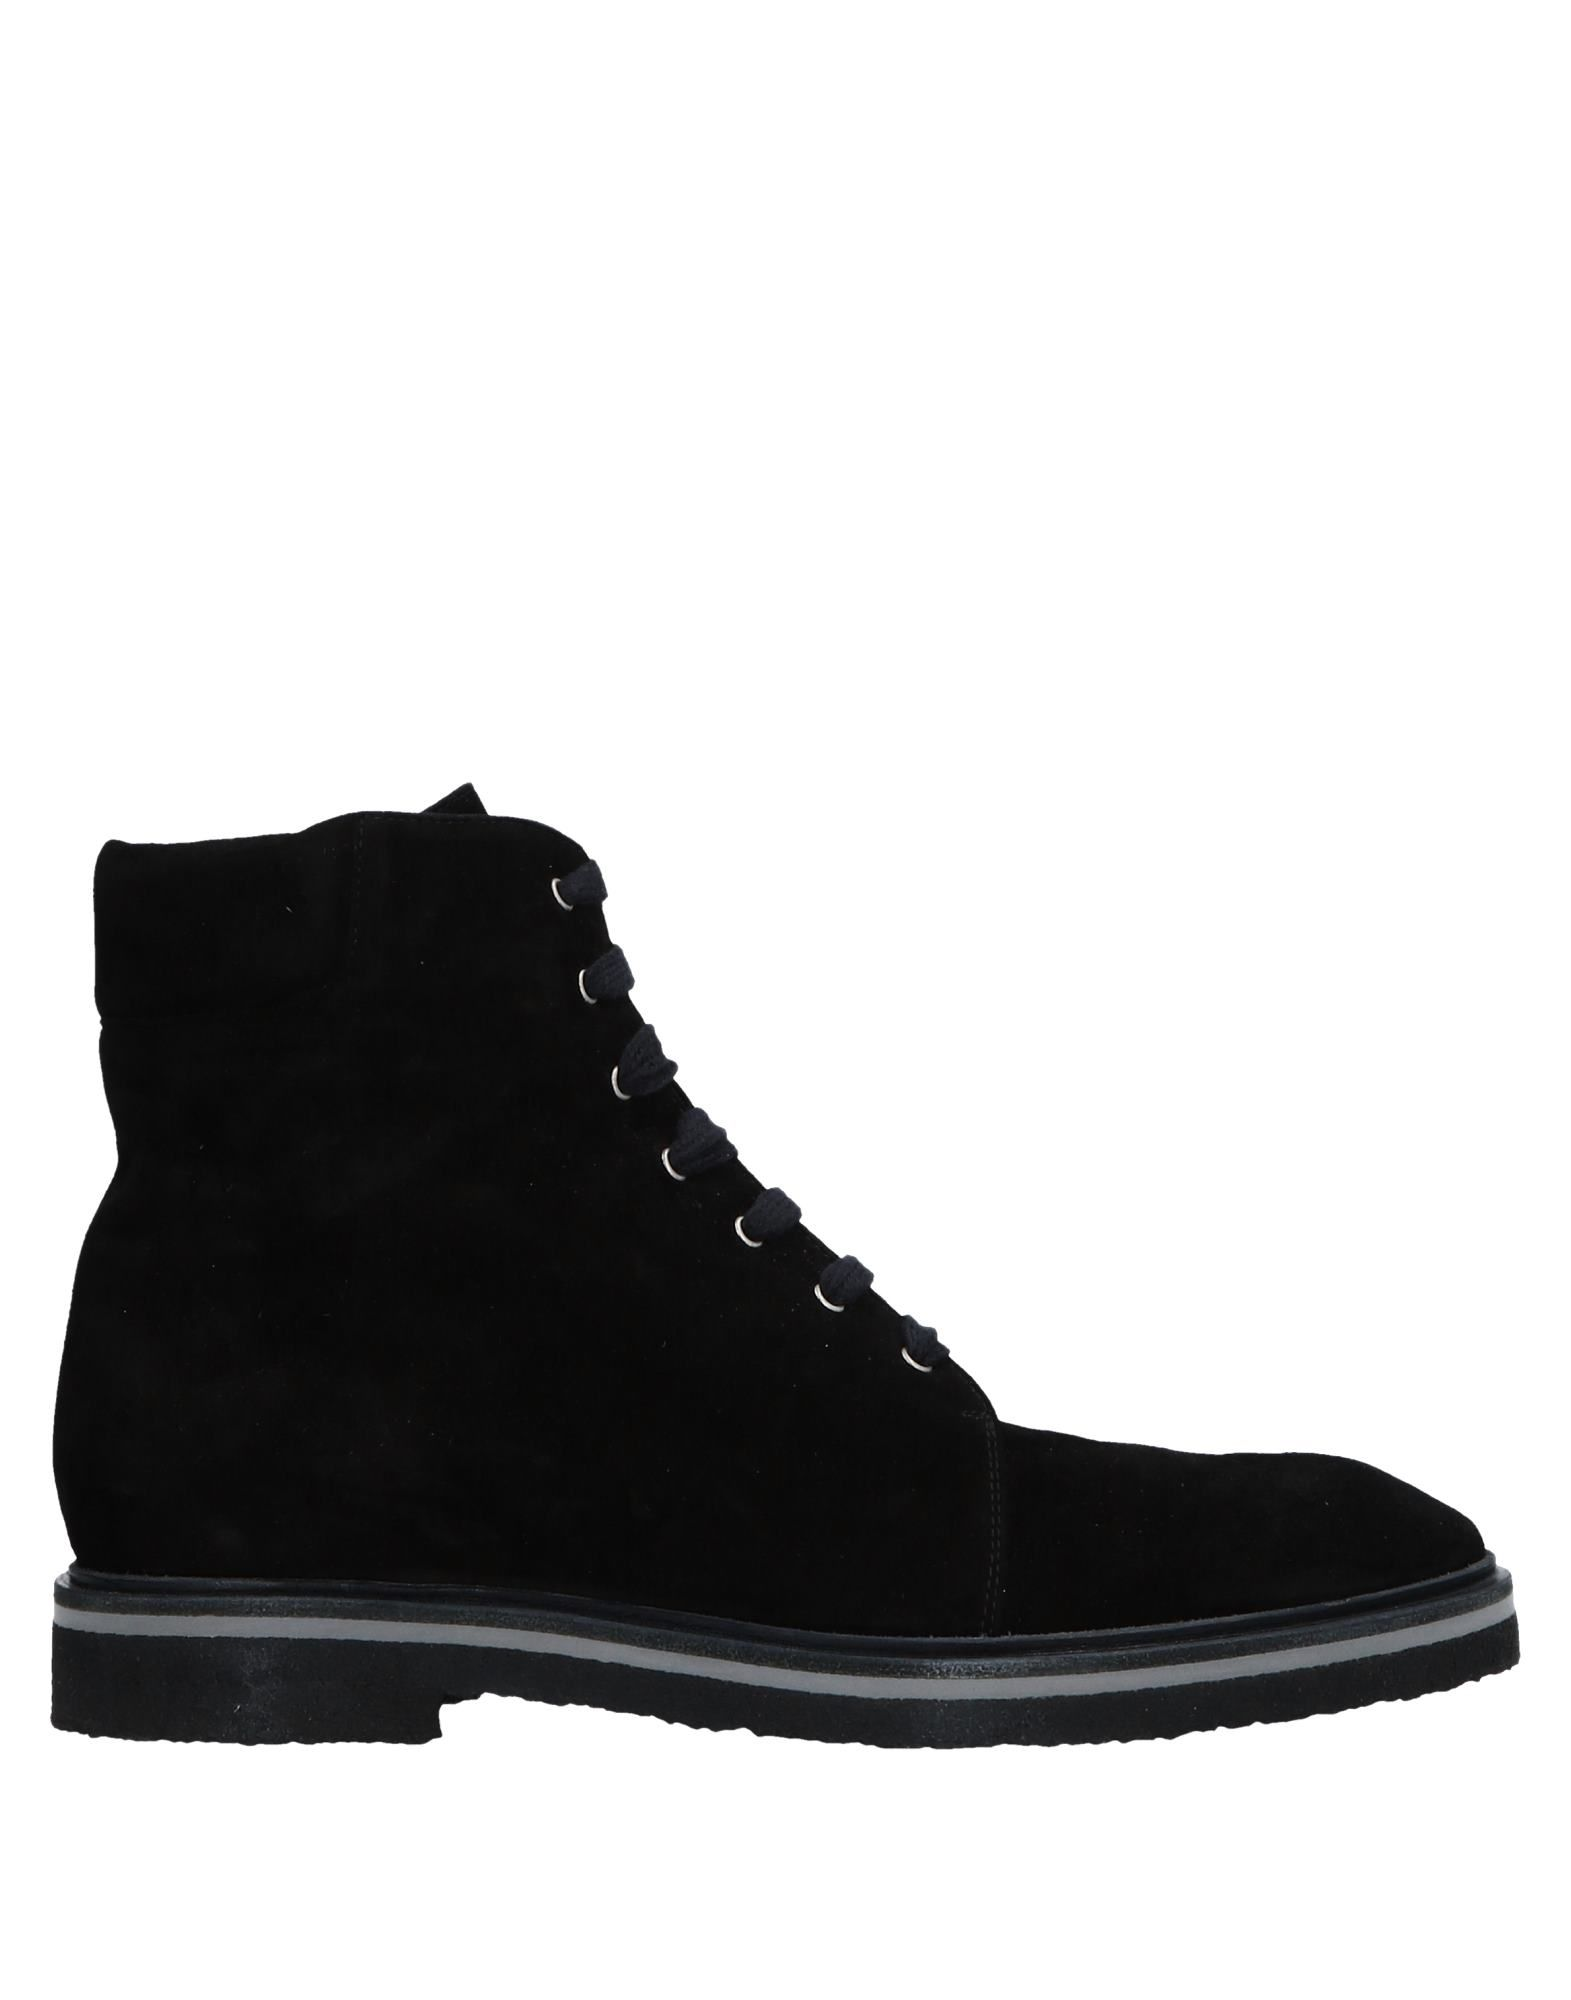 Pomme D'or Stiefelette Damen  11536339JIGut aussehende strapazierfähige Schuhe